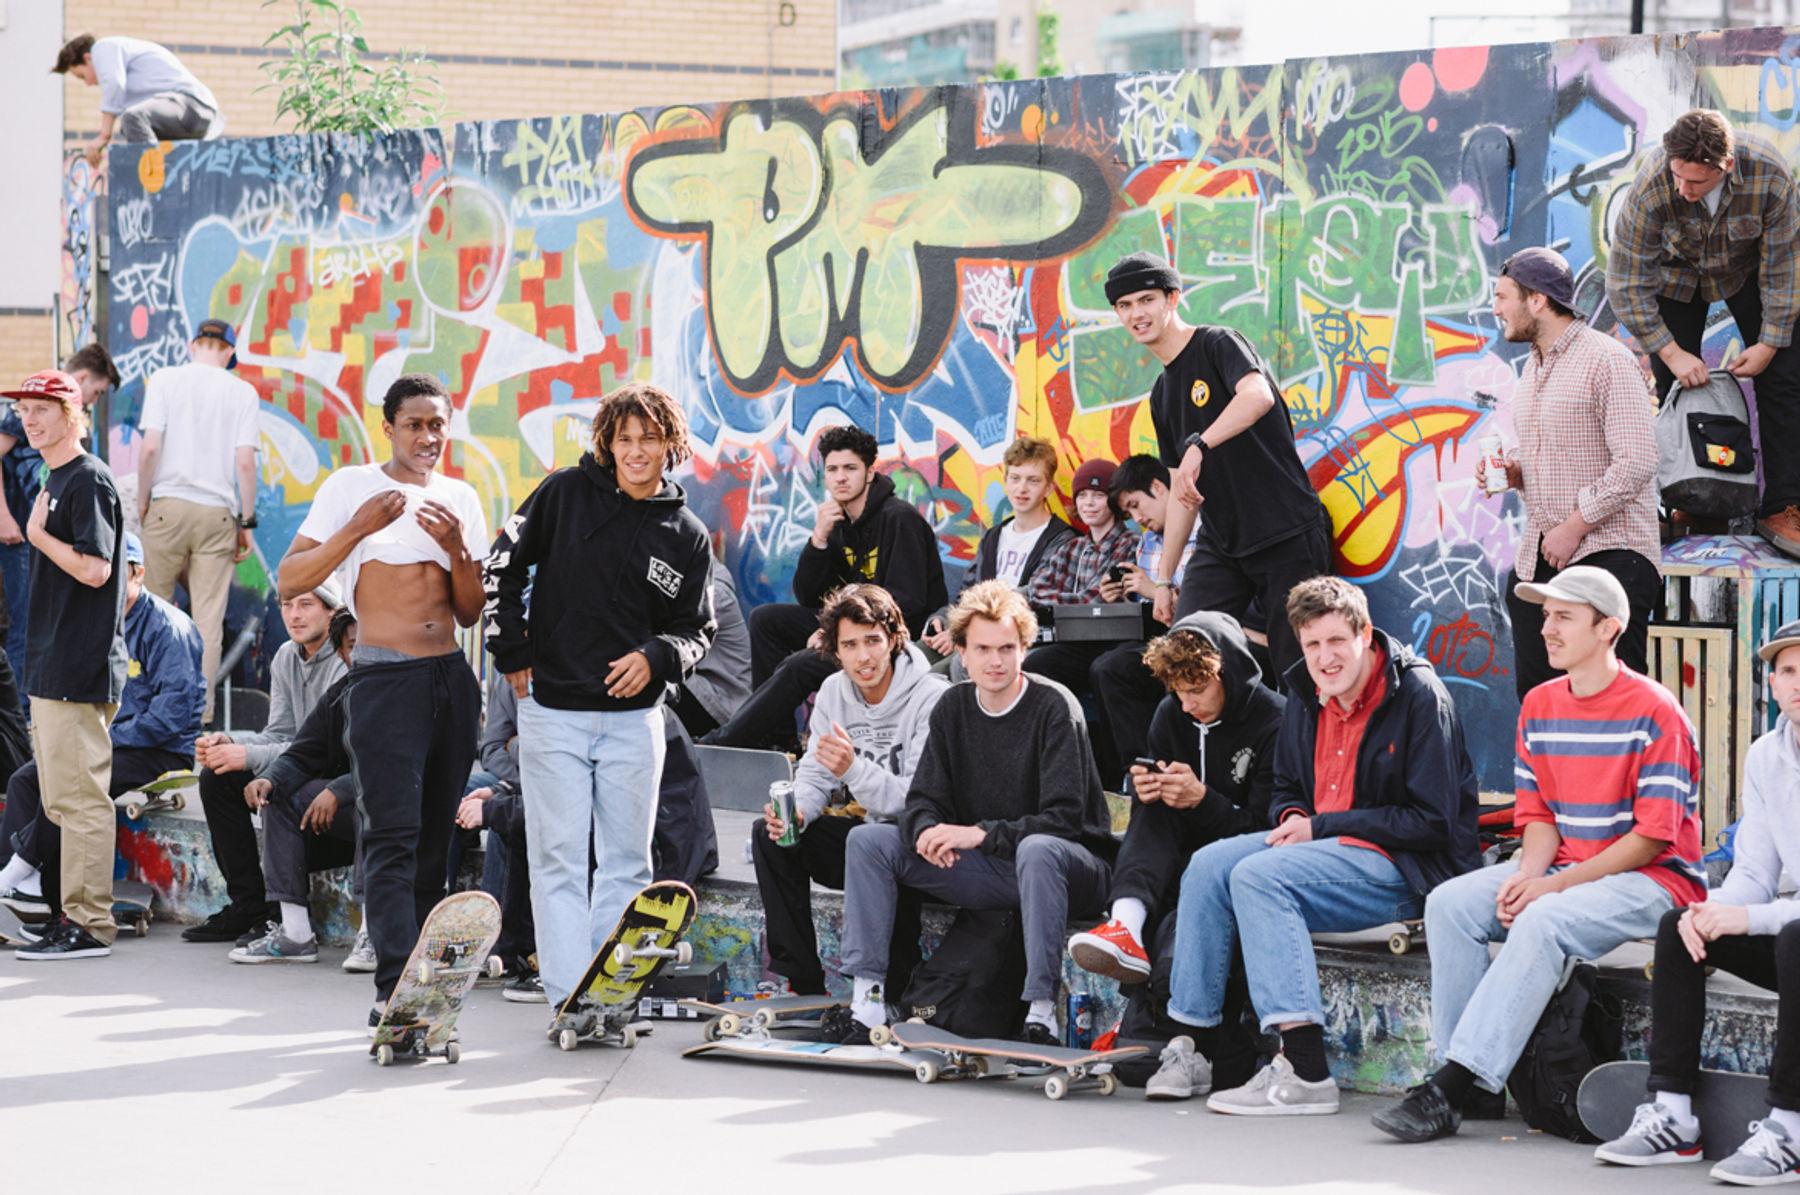 _IHC3687e-Nelly-Mayele-Darius-Trabalza-Tom-Knox-Nick-Jensen-Ben-Raemers-DC-Special-Delivery-Skate-Tour-BTS-Demo-Mile-End-London-May-2015-Photographer-Maksim-Kalanep